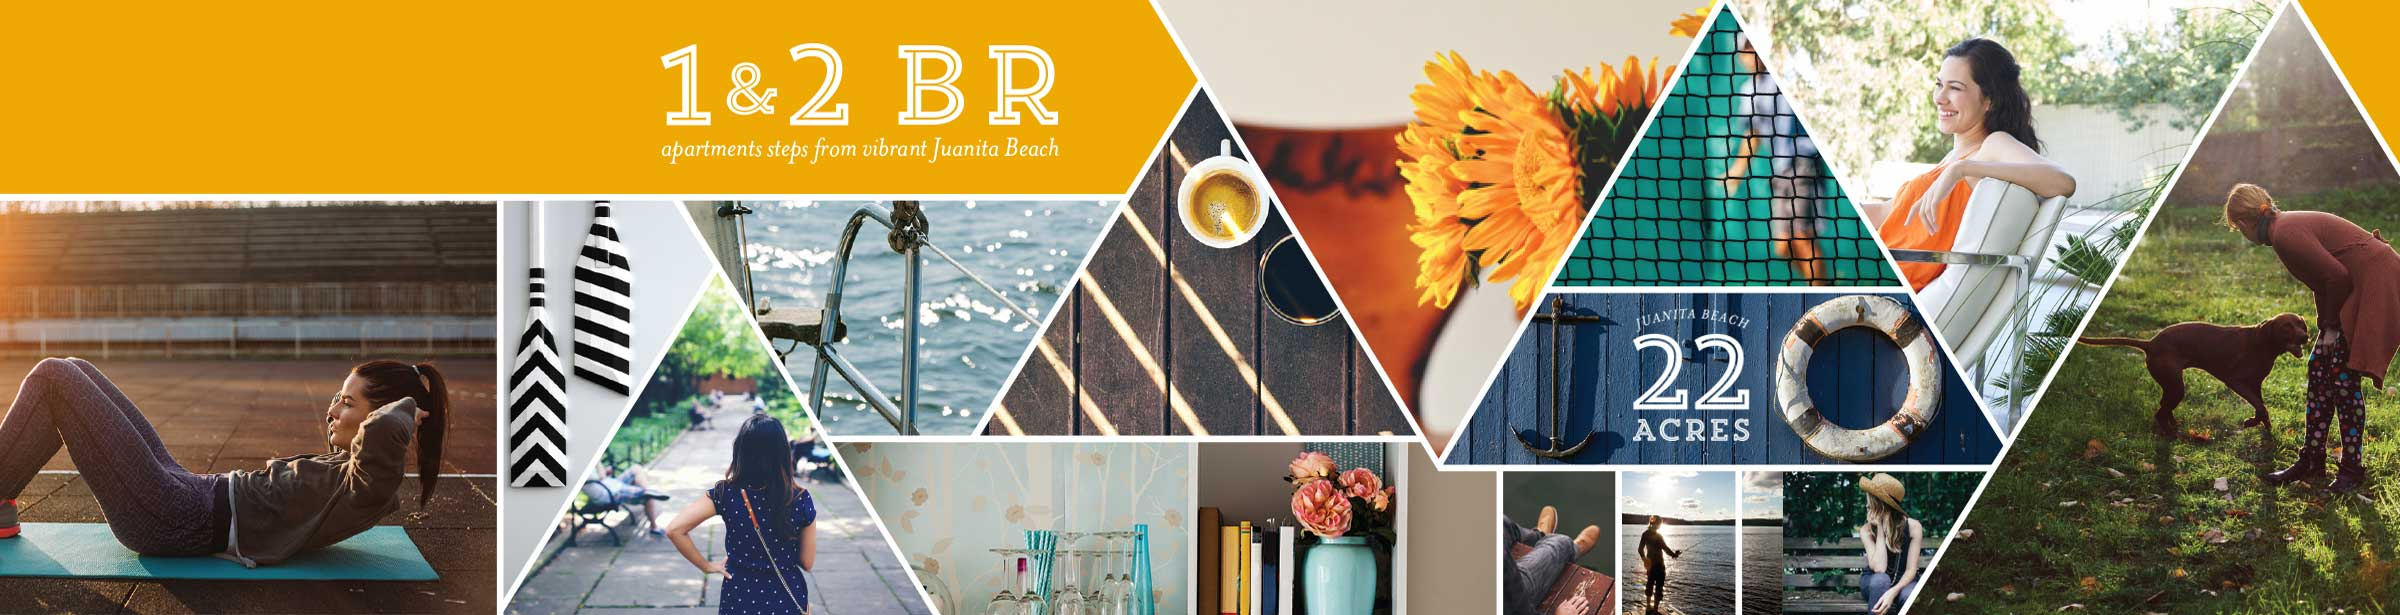 Starboard Apartments: 1 & 2 Bedroom apartments steps from vibrant Juanita Beach, Kirkland, Washington 98034